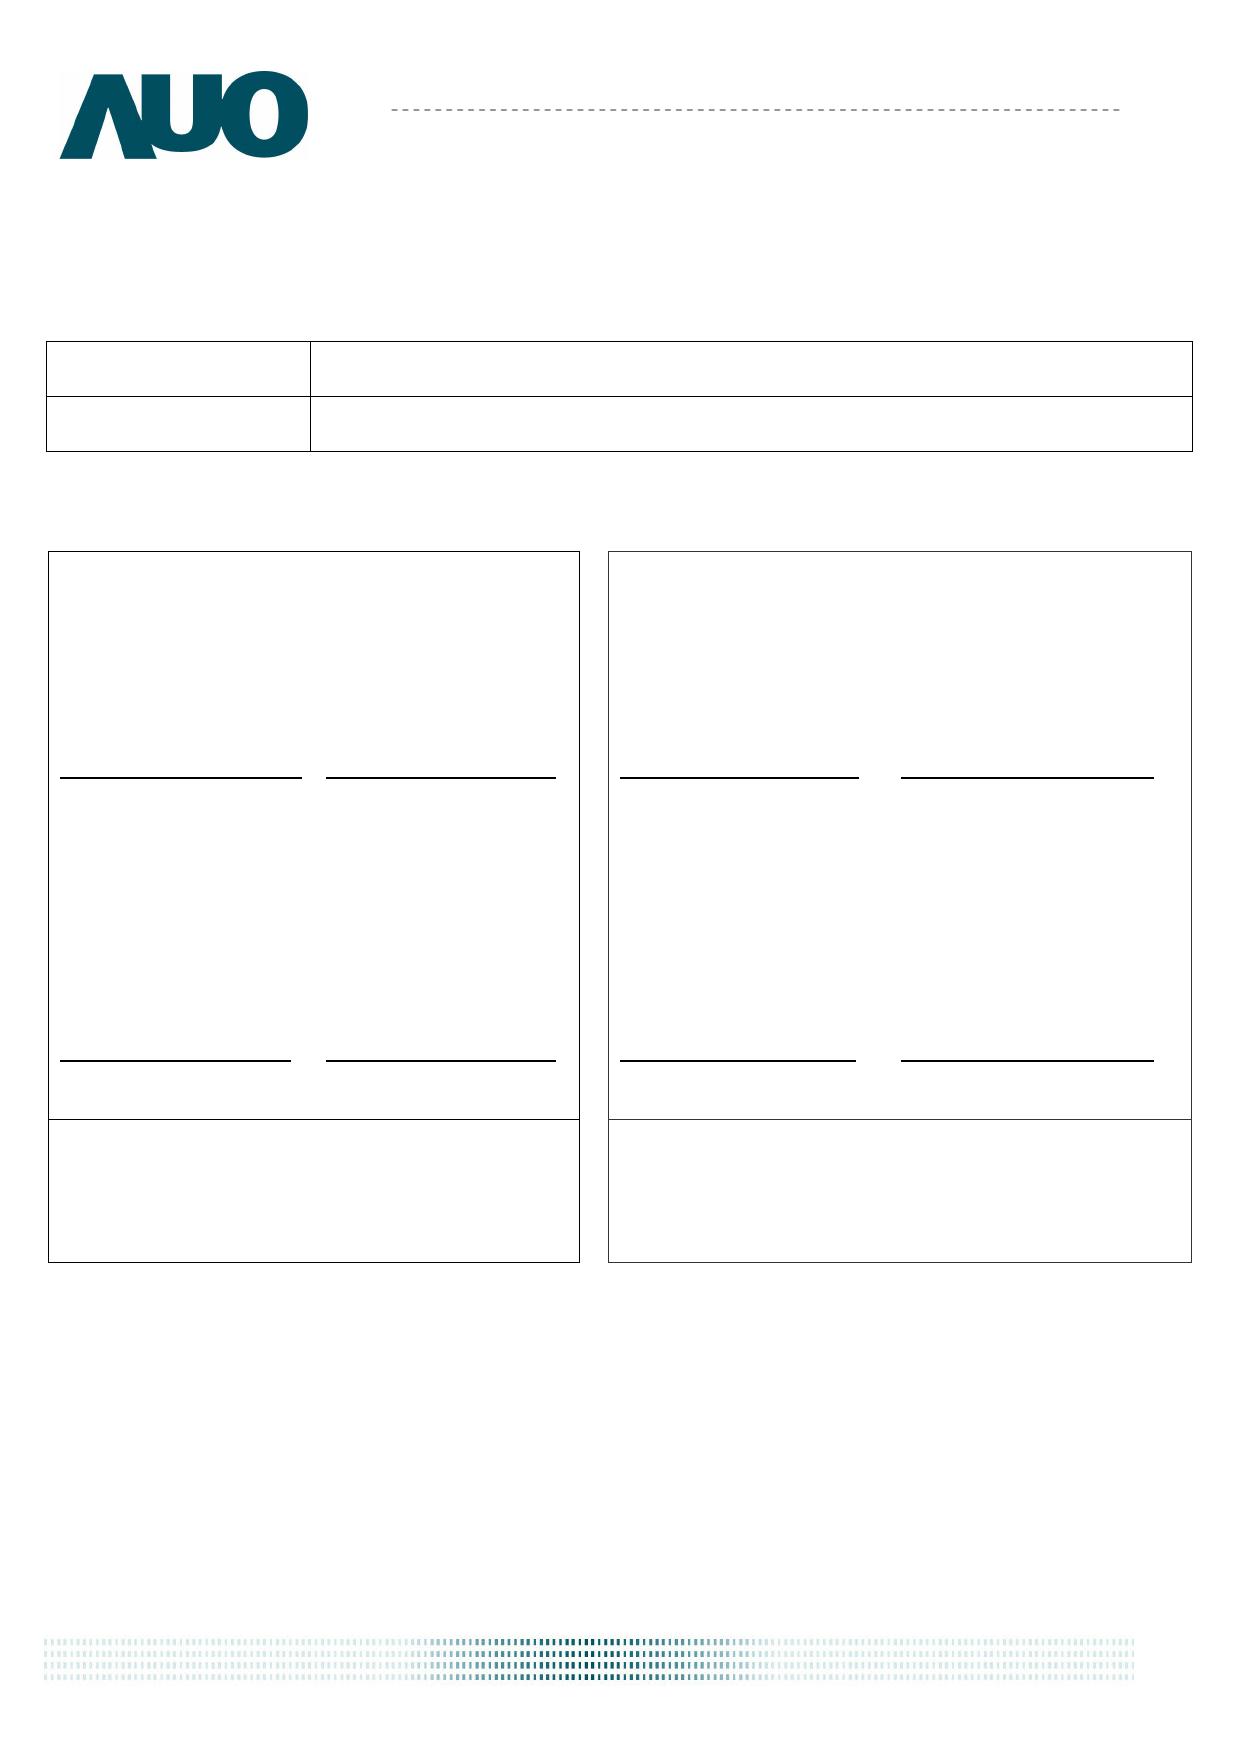 G057QN01_V1 datasheet